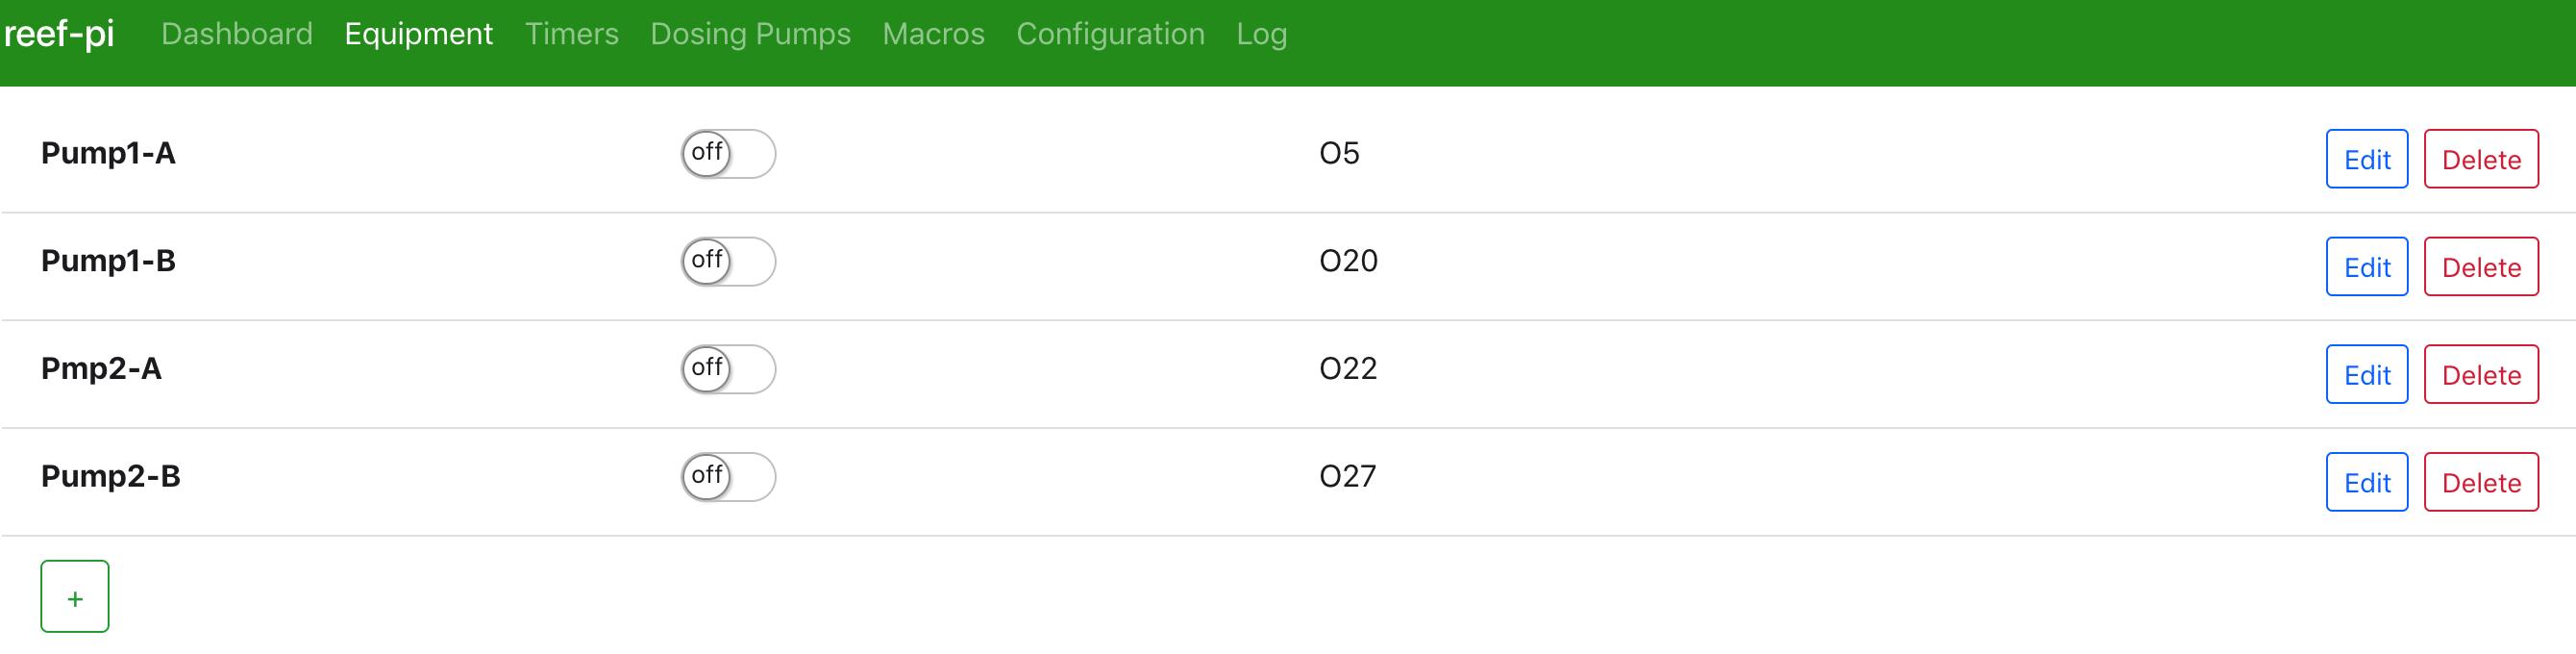 components_Screen_Shot_2018-11-17_at_2.46.27_AM.png